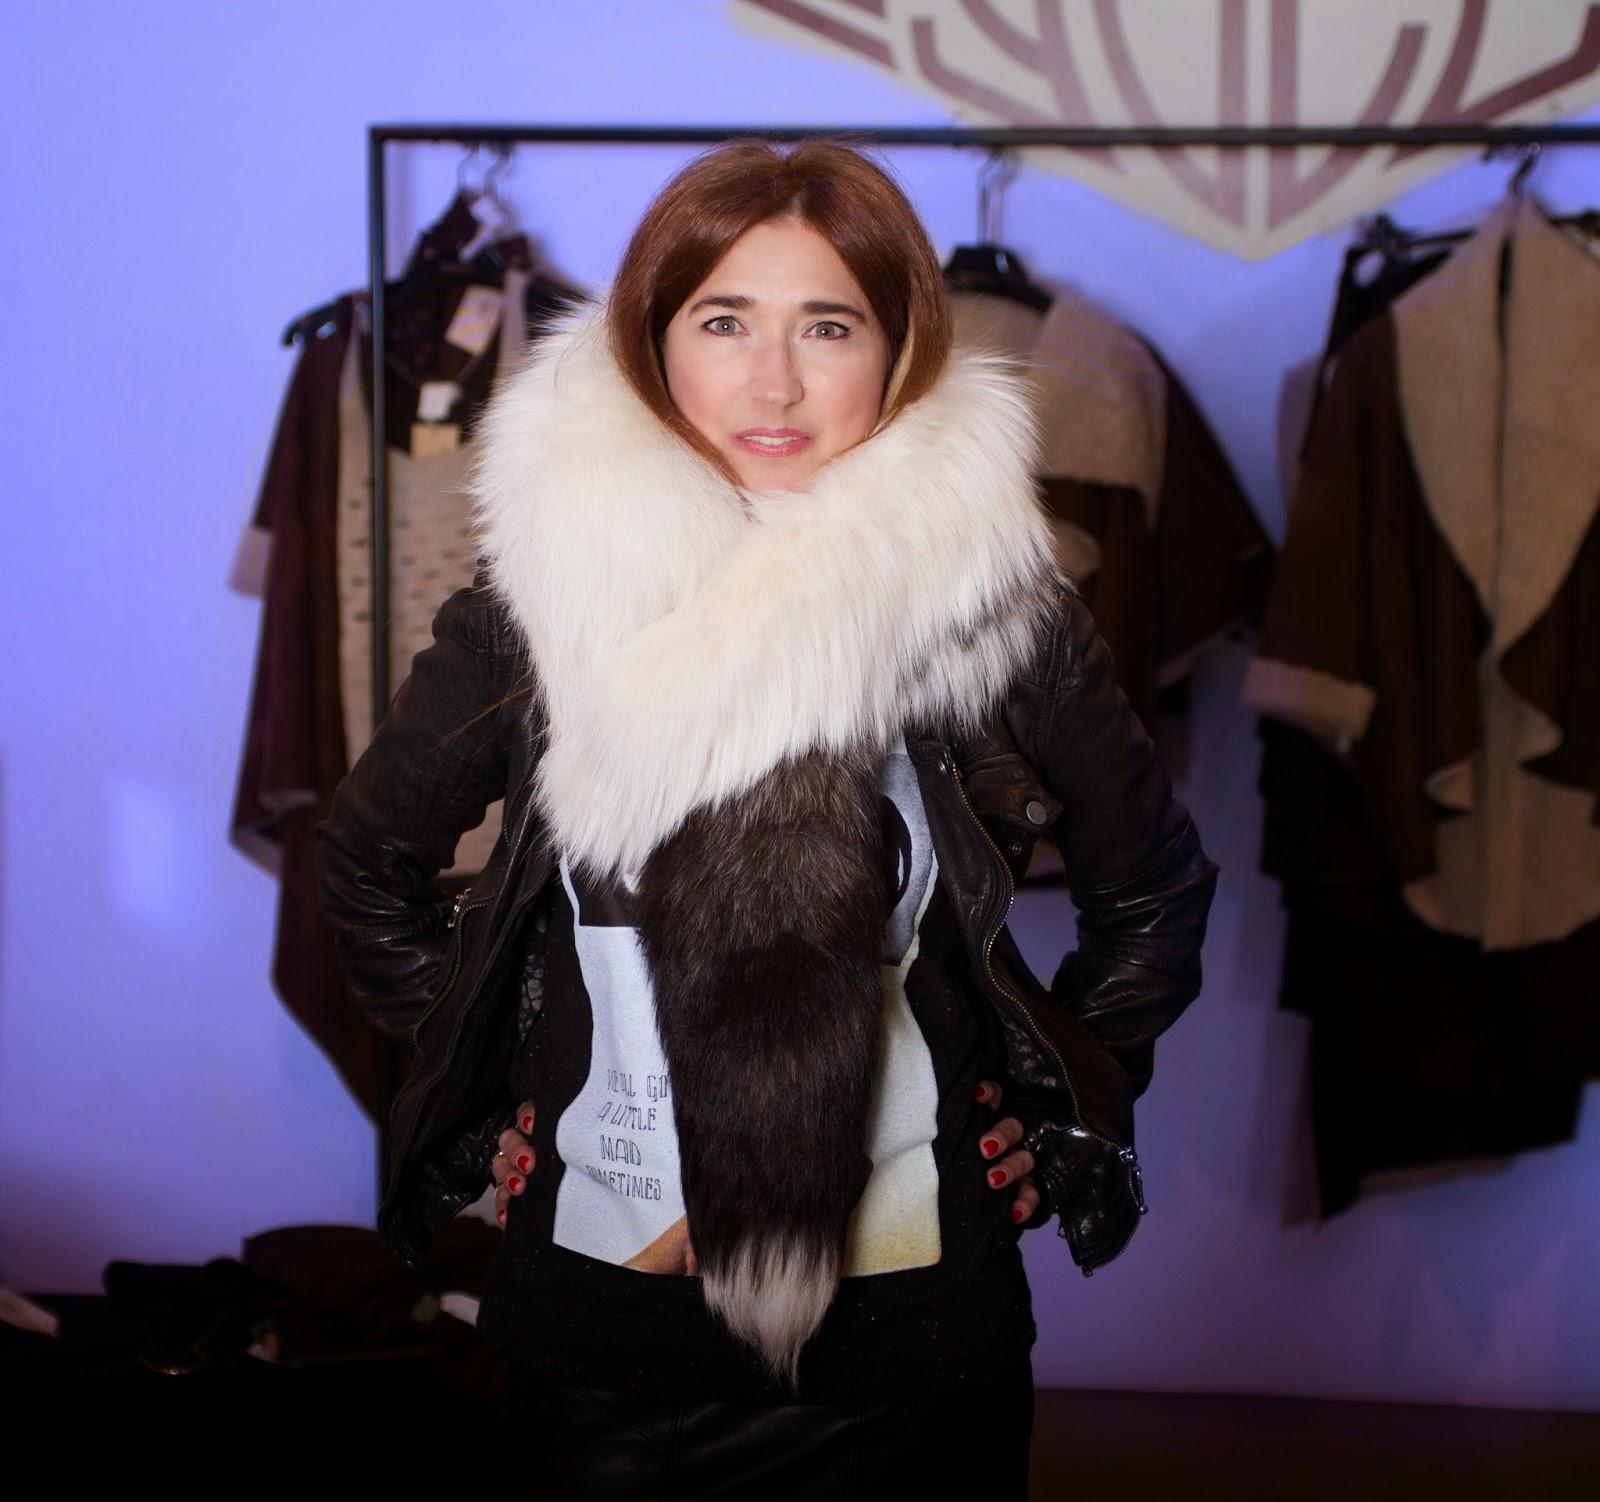 Yaël Barnatan, Elena Benarroch, leather, complementos, moda, fashion style, street style, fashion blogger, Carmen Hummer